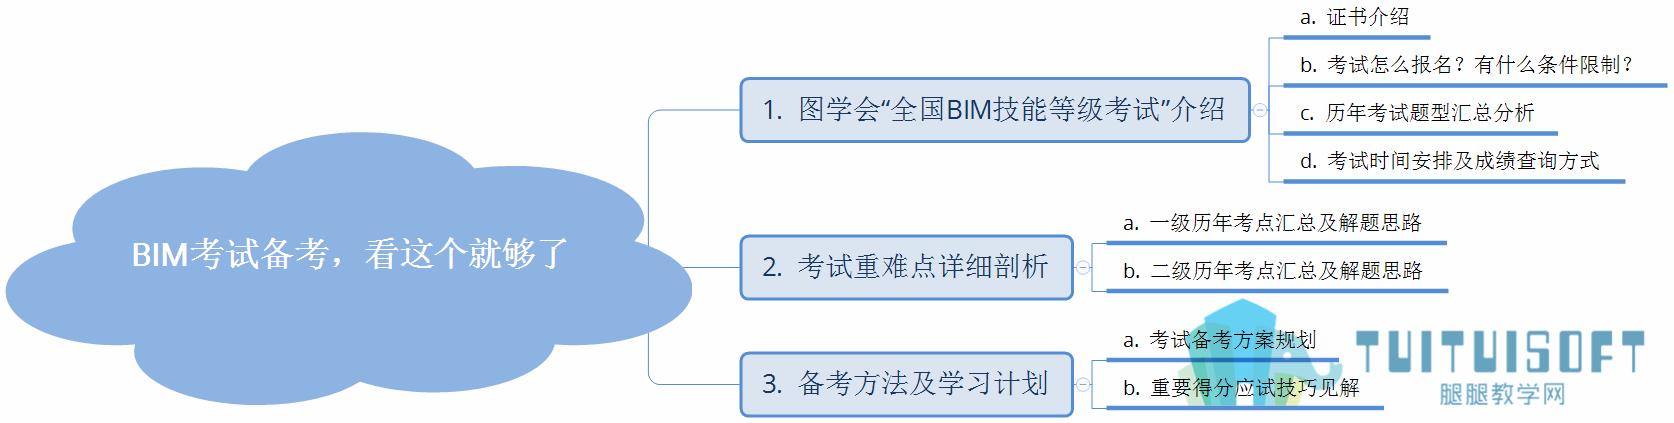 BIM考试备考-课程结构.png